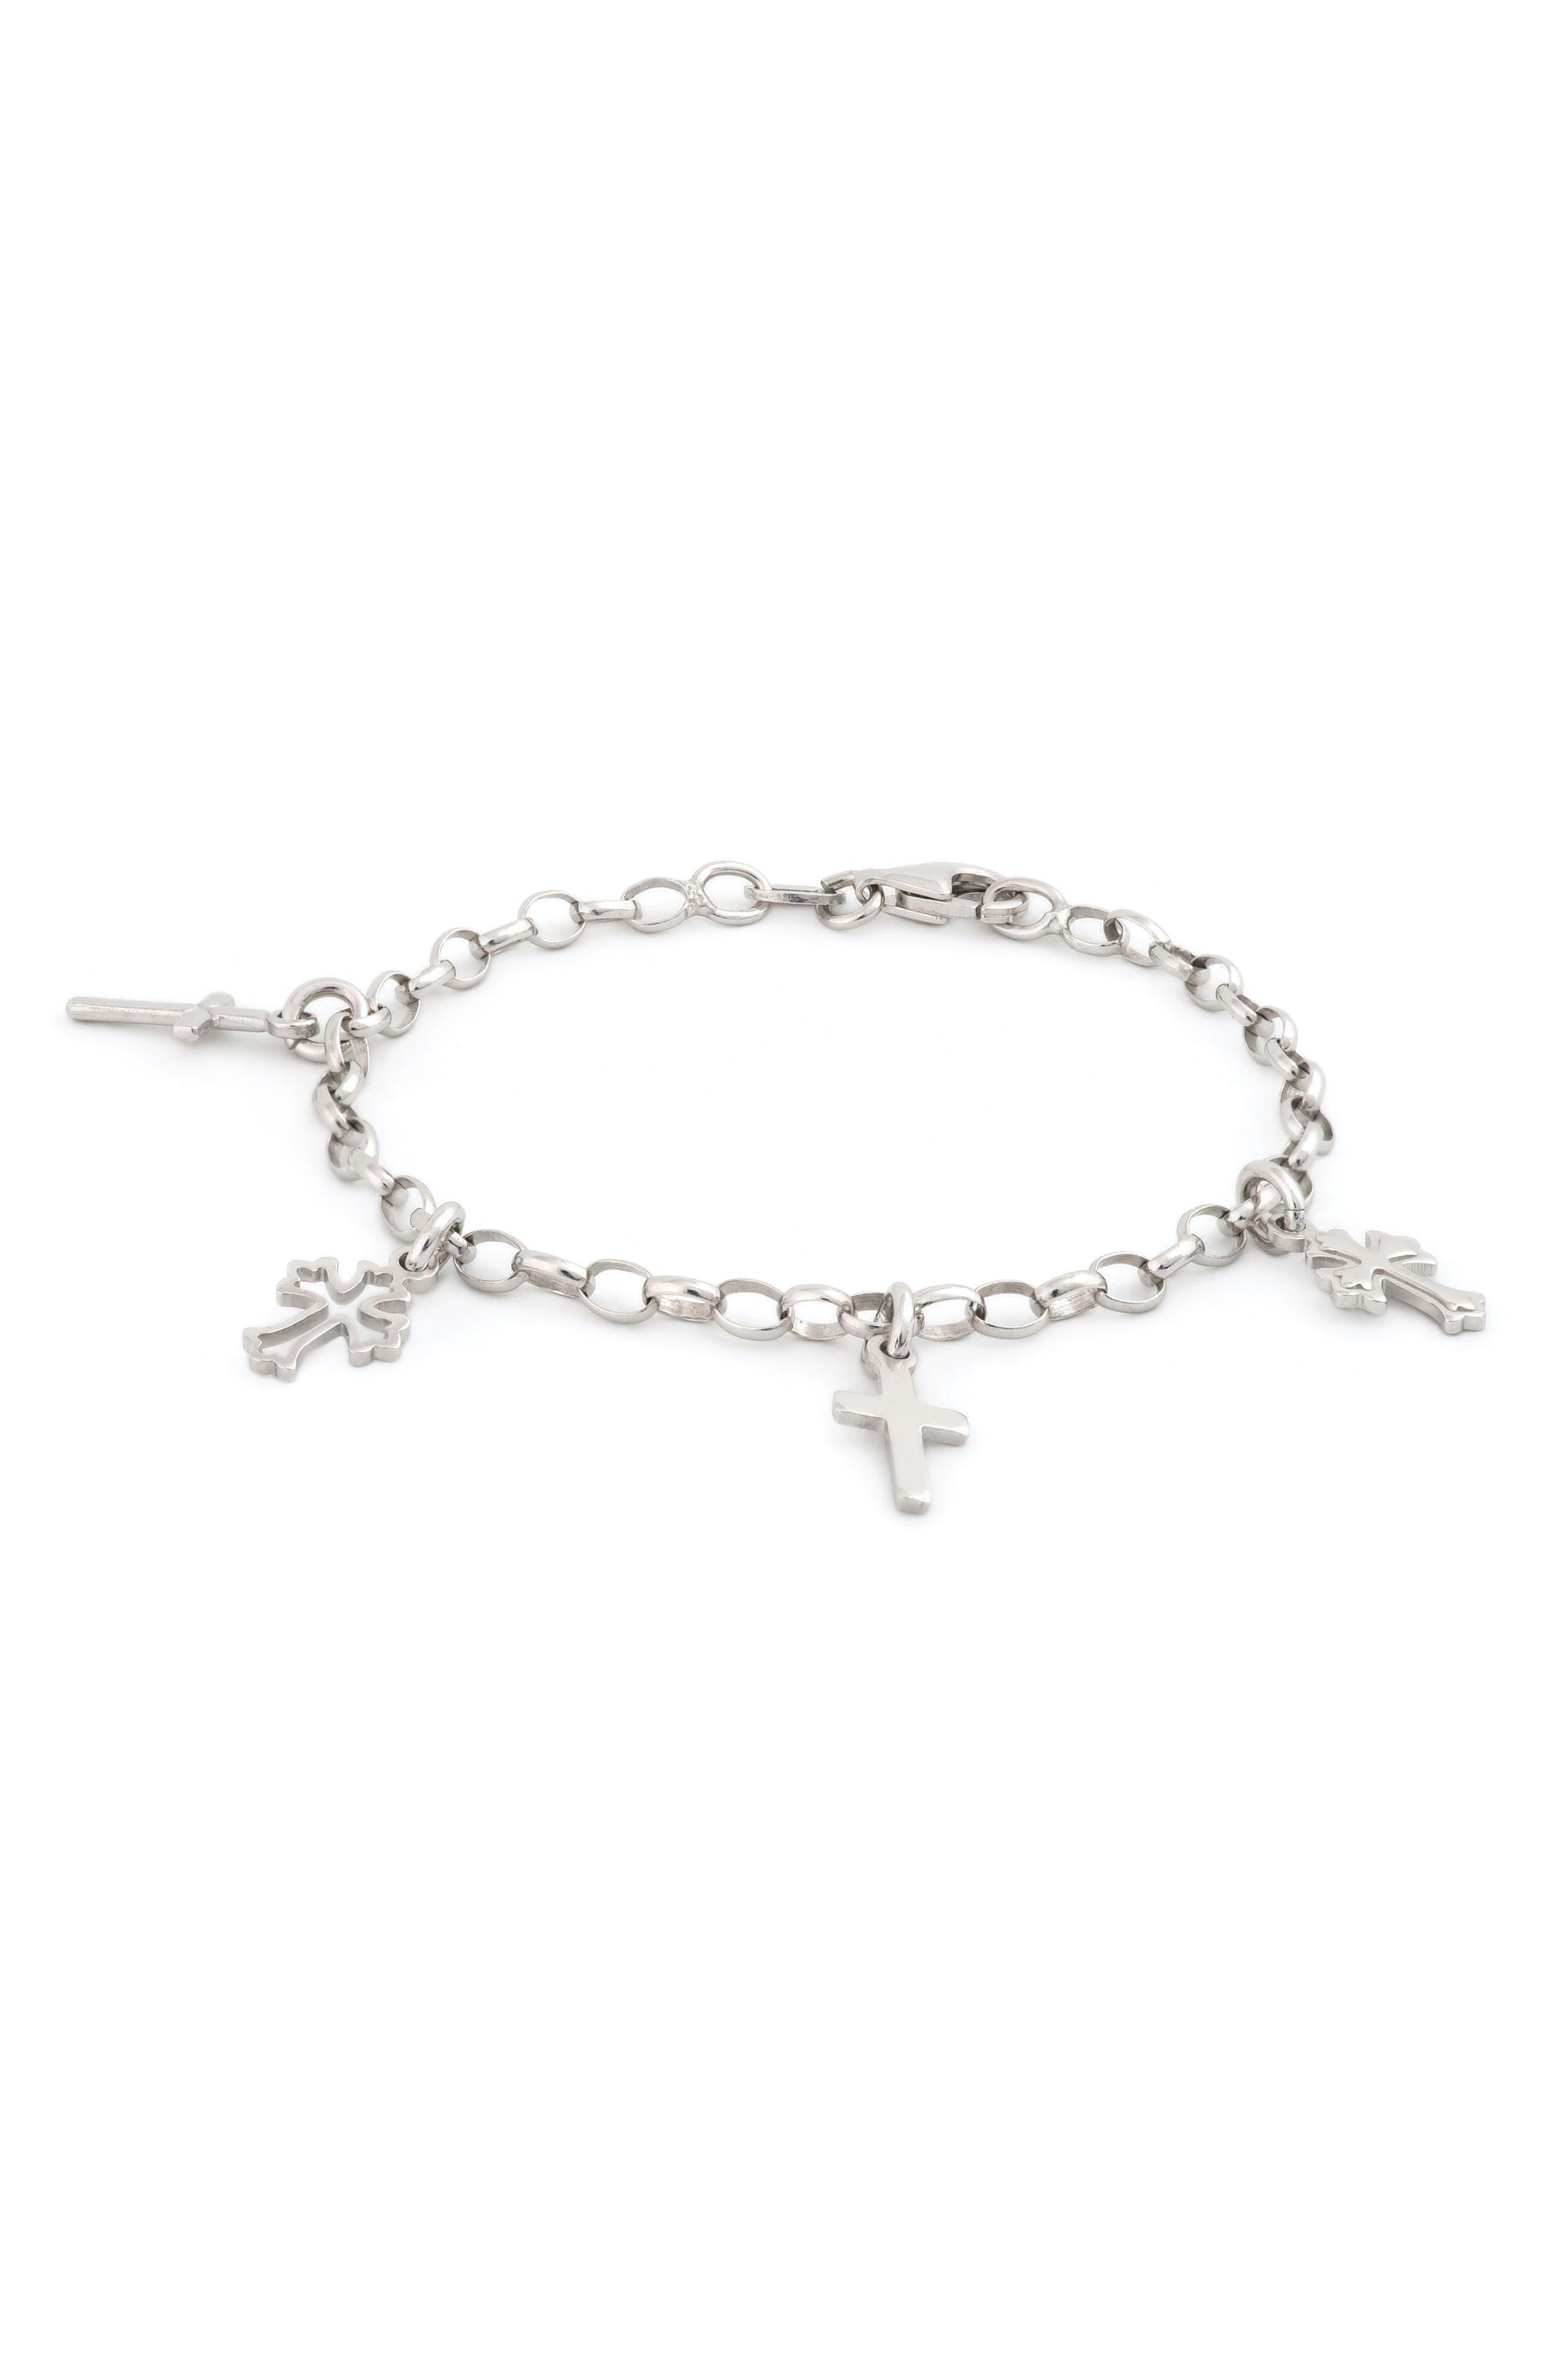 SPEIDEL Sterling Silver Cross Bracelet